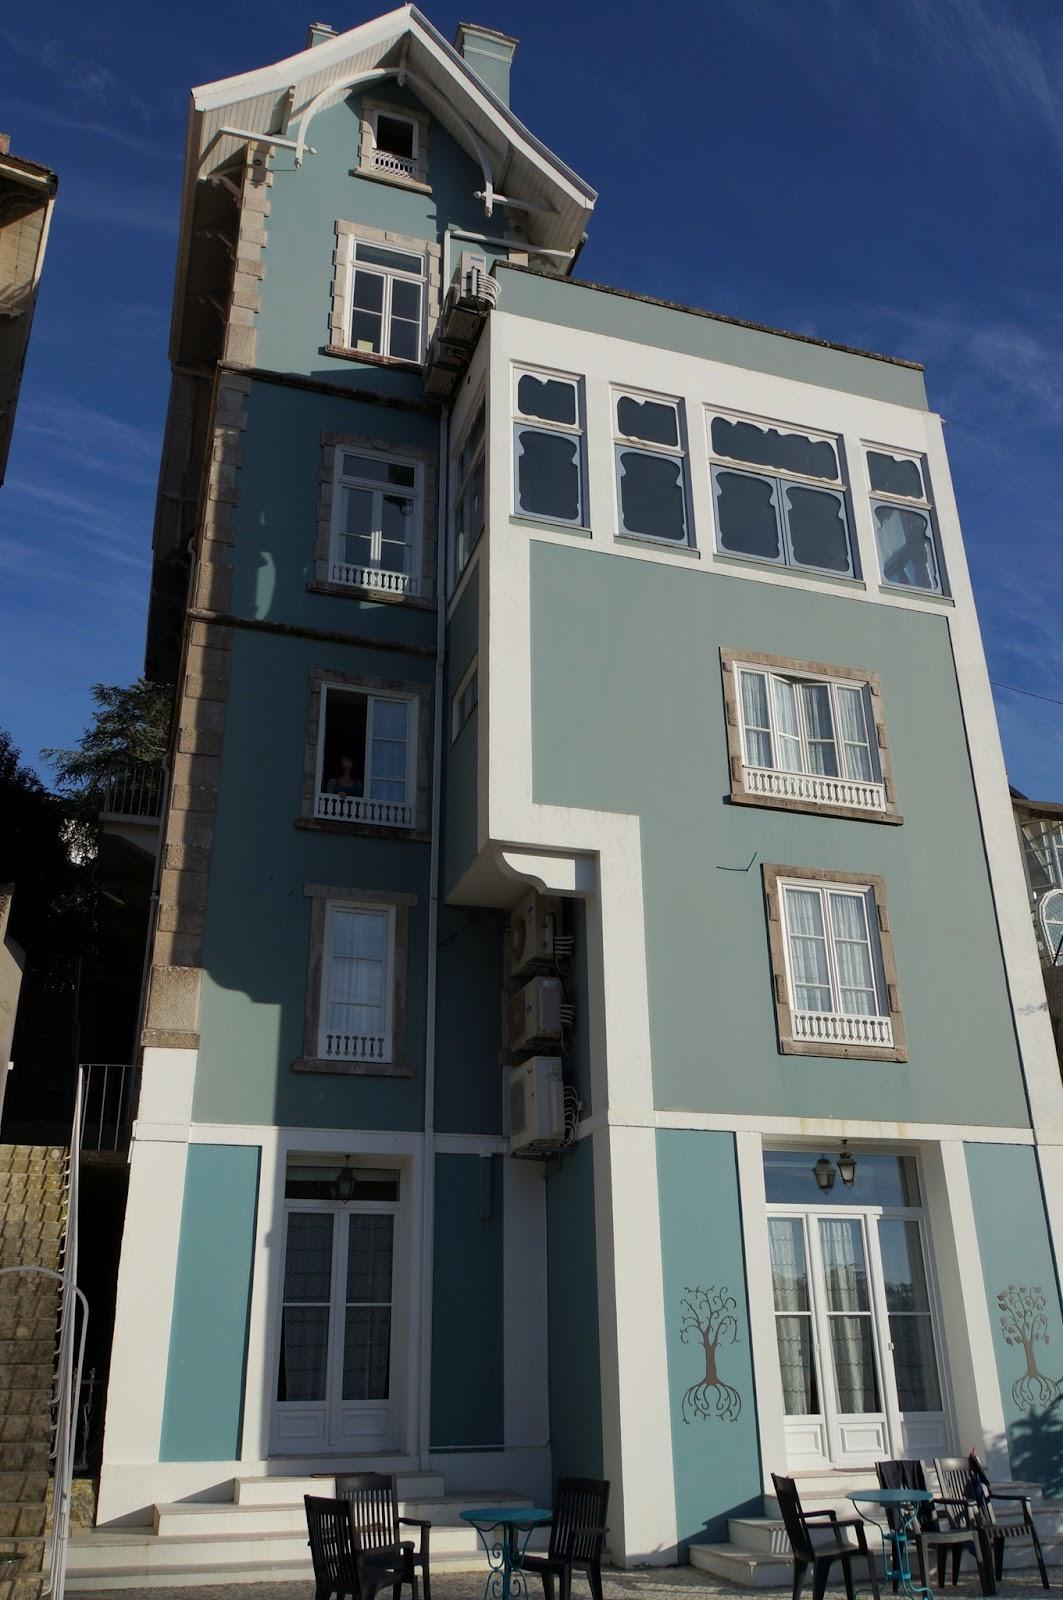 Chalet Saudade - Sintra - Portugal